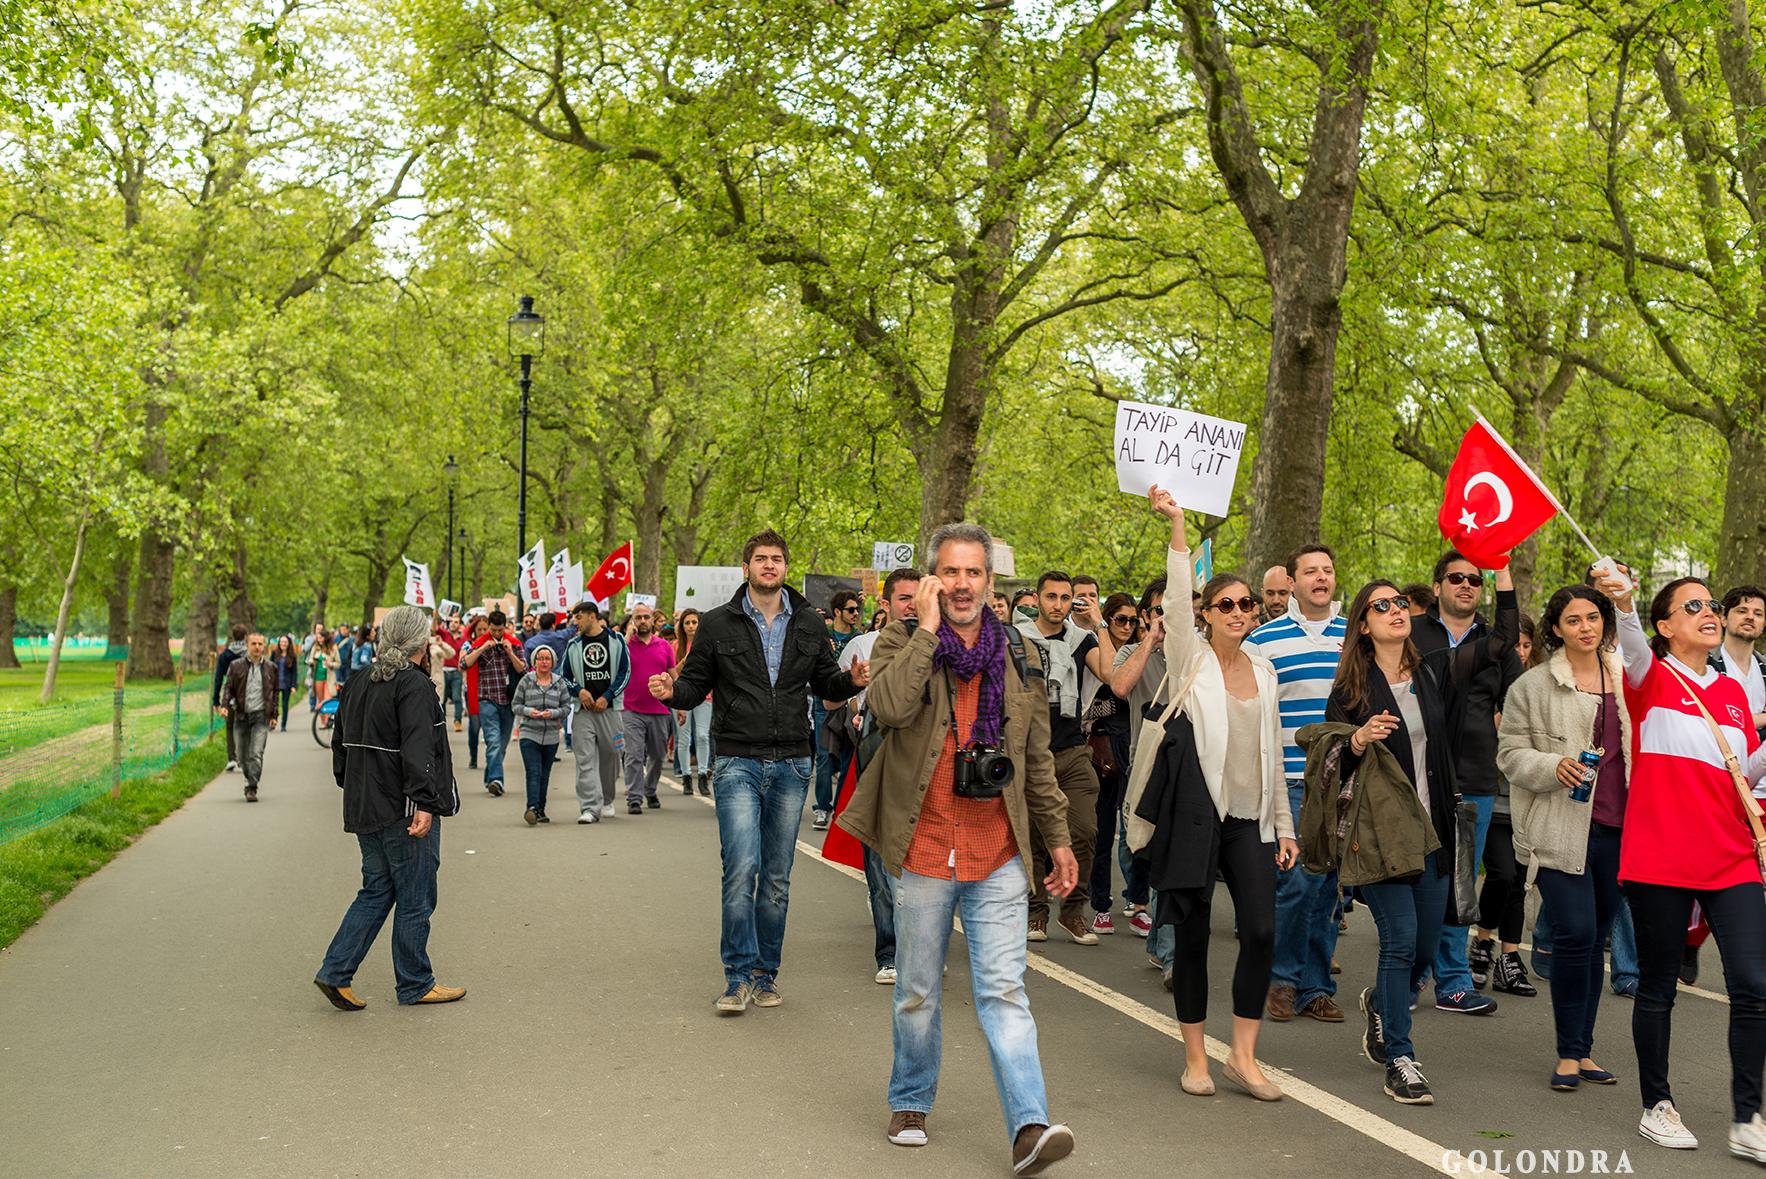 Protesting Turkish Government - Turk Hukumetini Protesto - Londra - London (29)